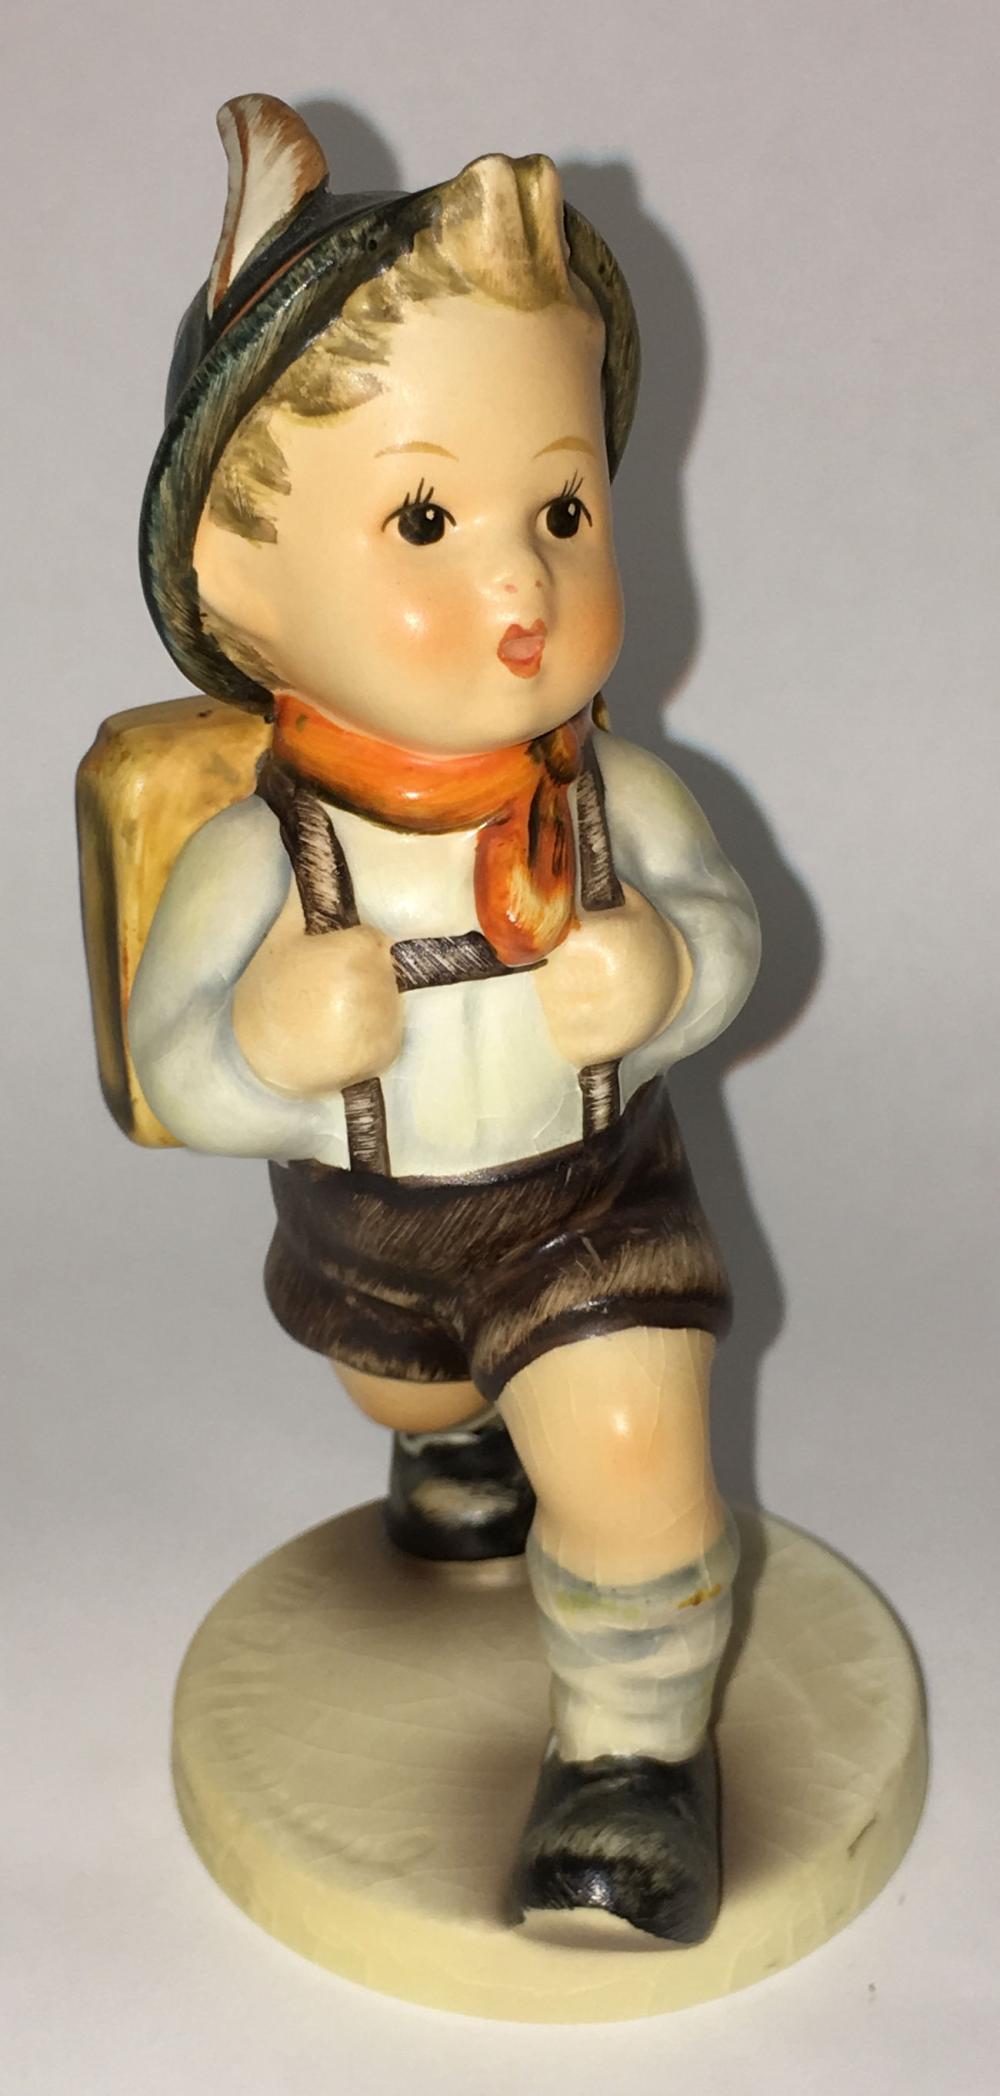 Hummel Figurine School Boy